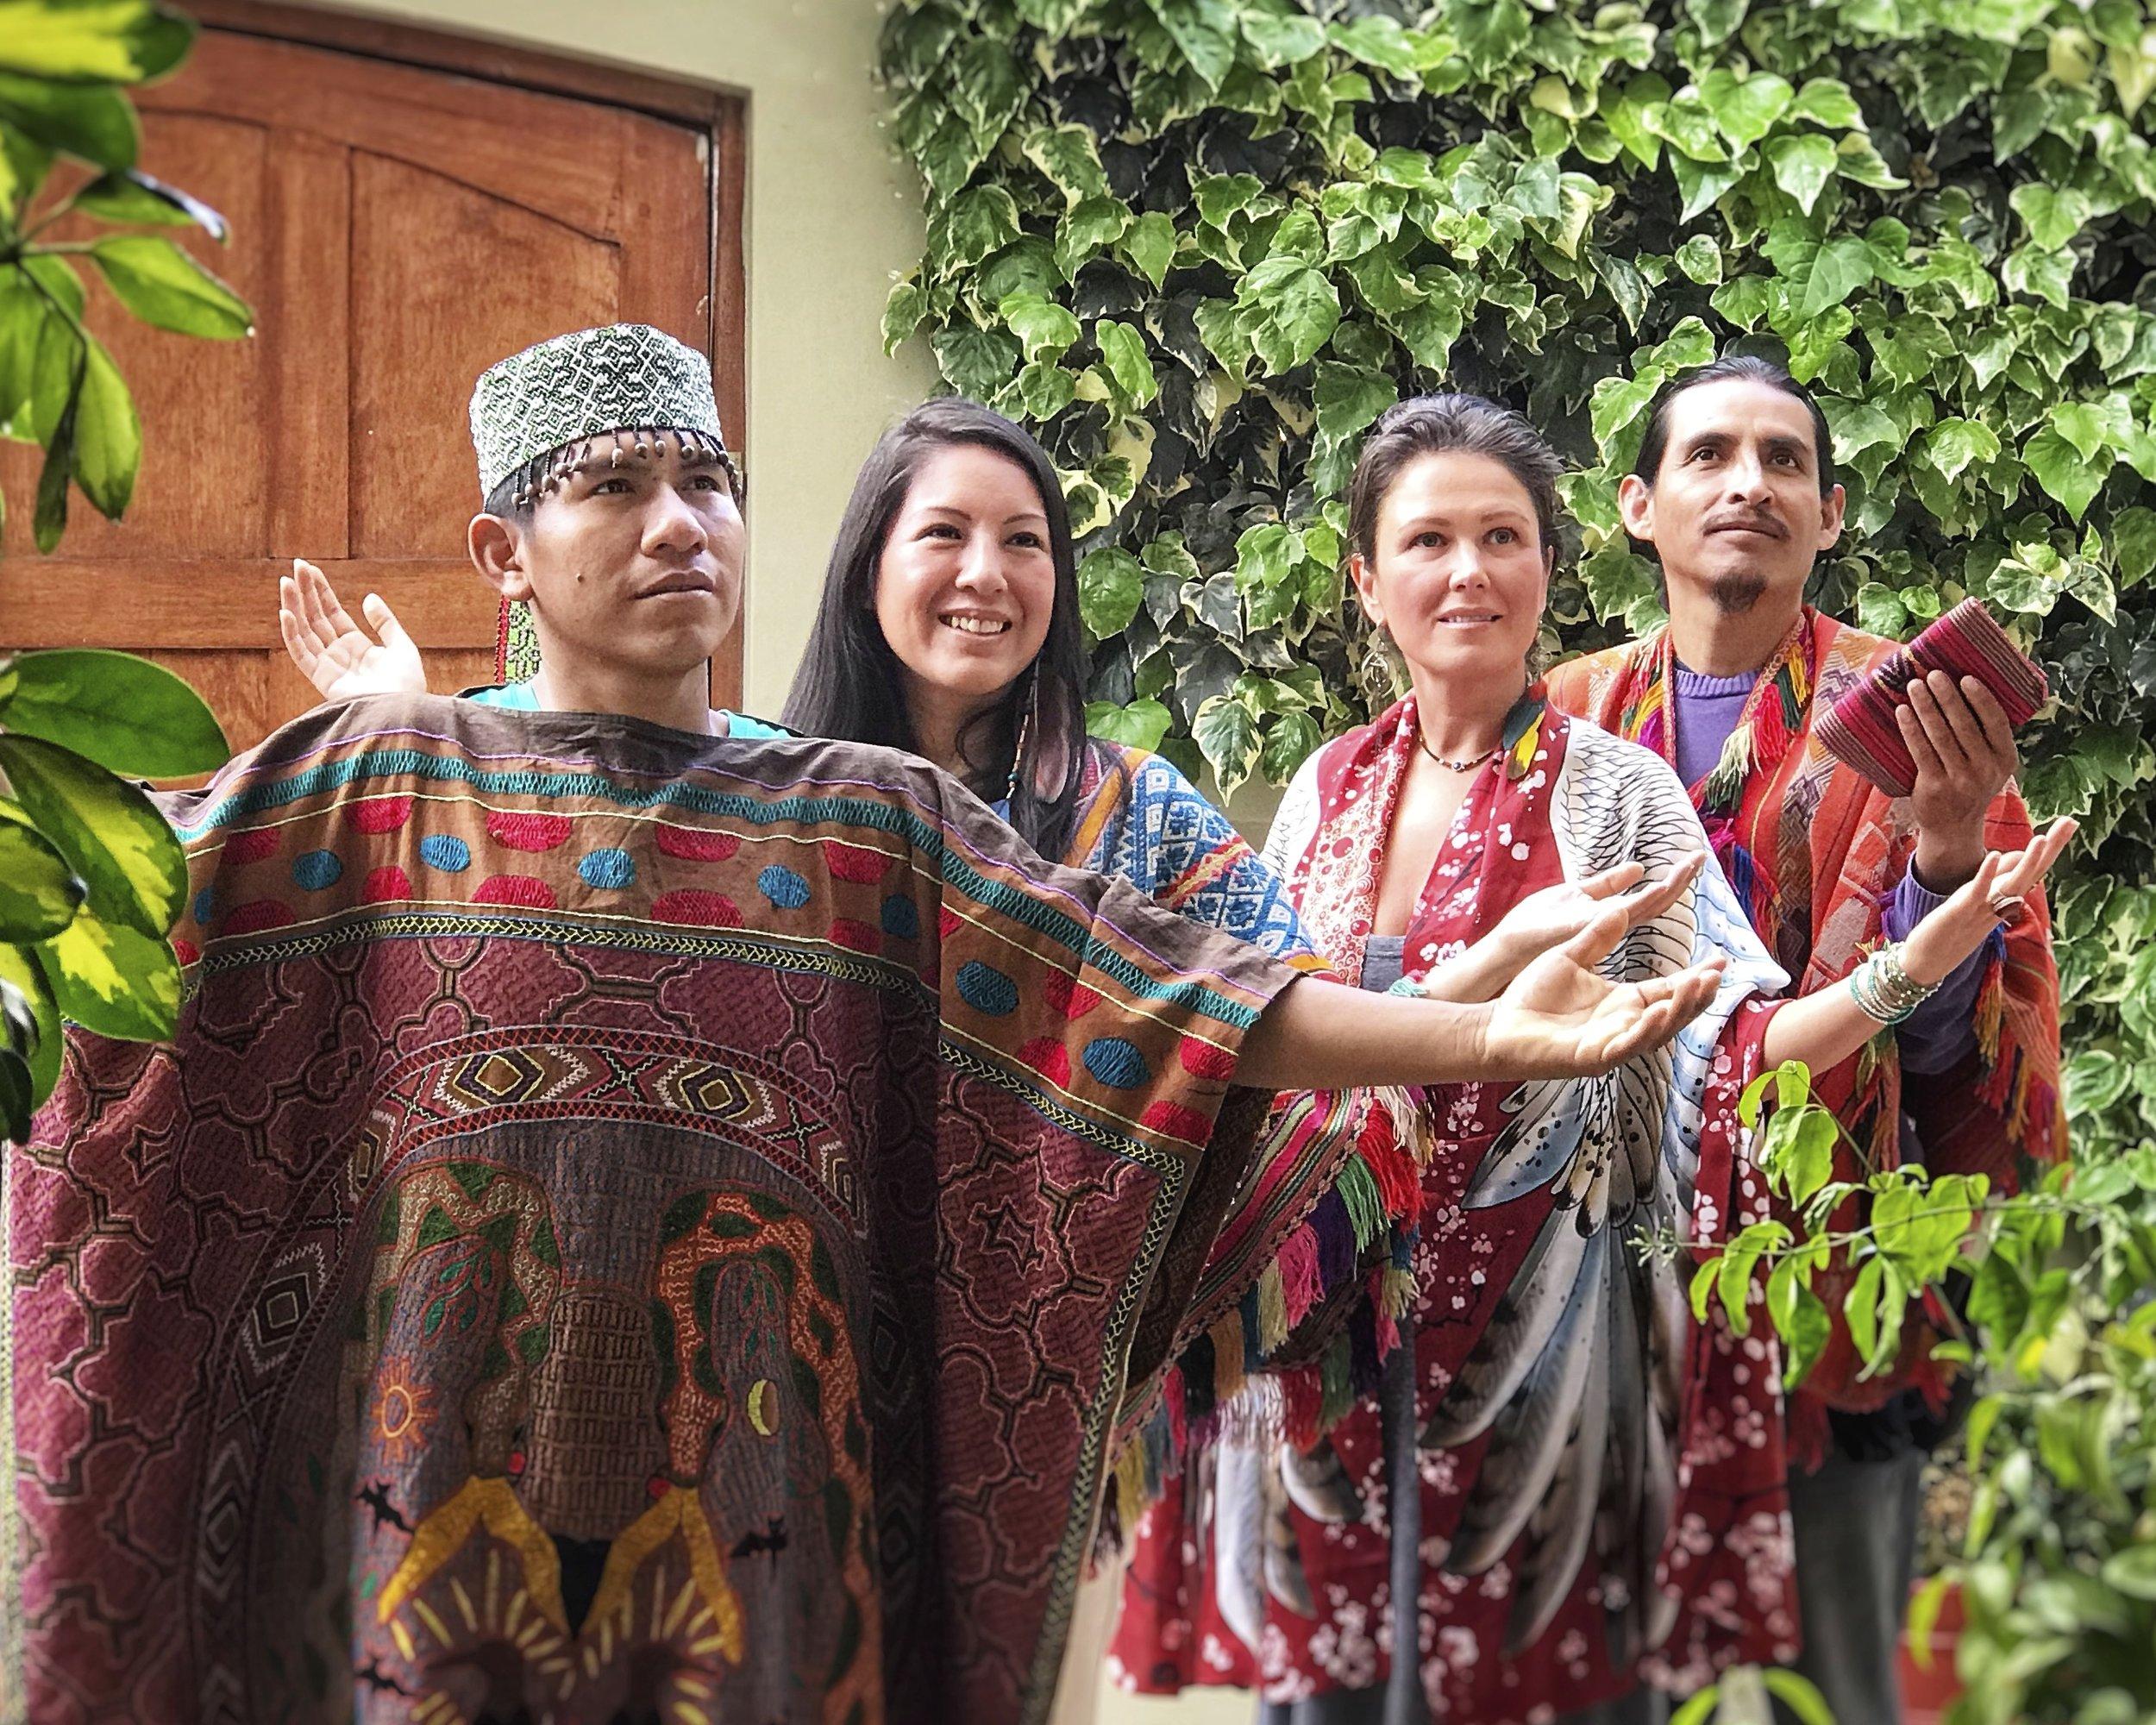 The Ceremonial Team - Left to Right: Maestro Juan Carlos | Shipibo Curandero, Qorianka Cornejo | Inca High Priestess, Chloë Rain | Spiritual Guide & Founder of Explore Deeply, Peter Bermejo | Inca High Priest